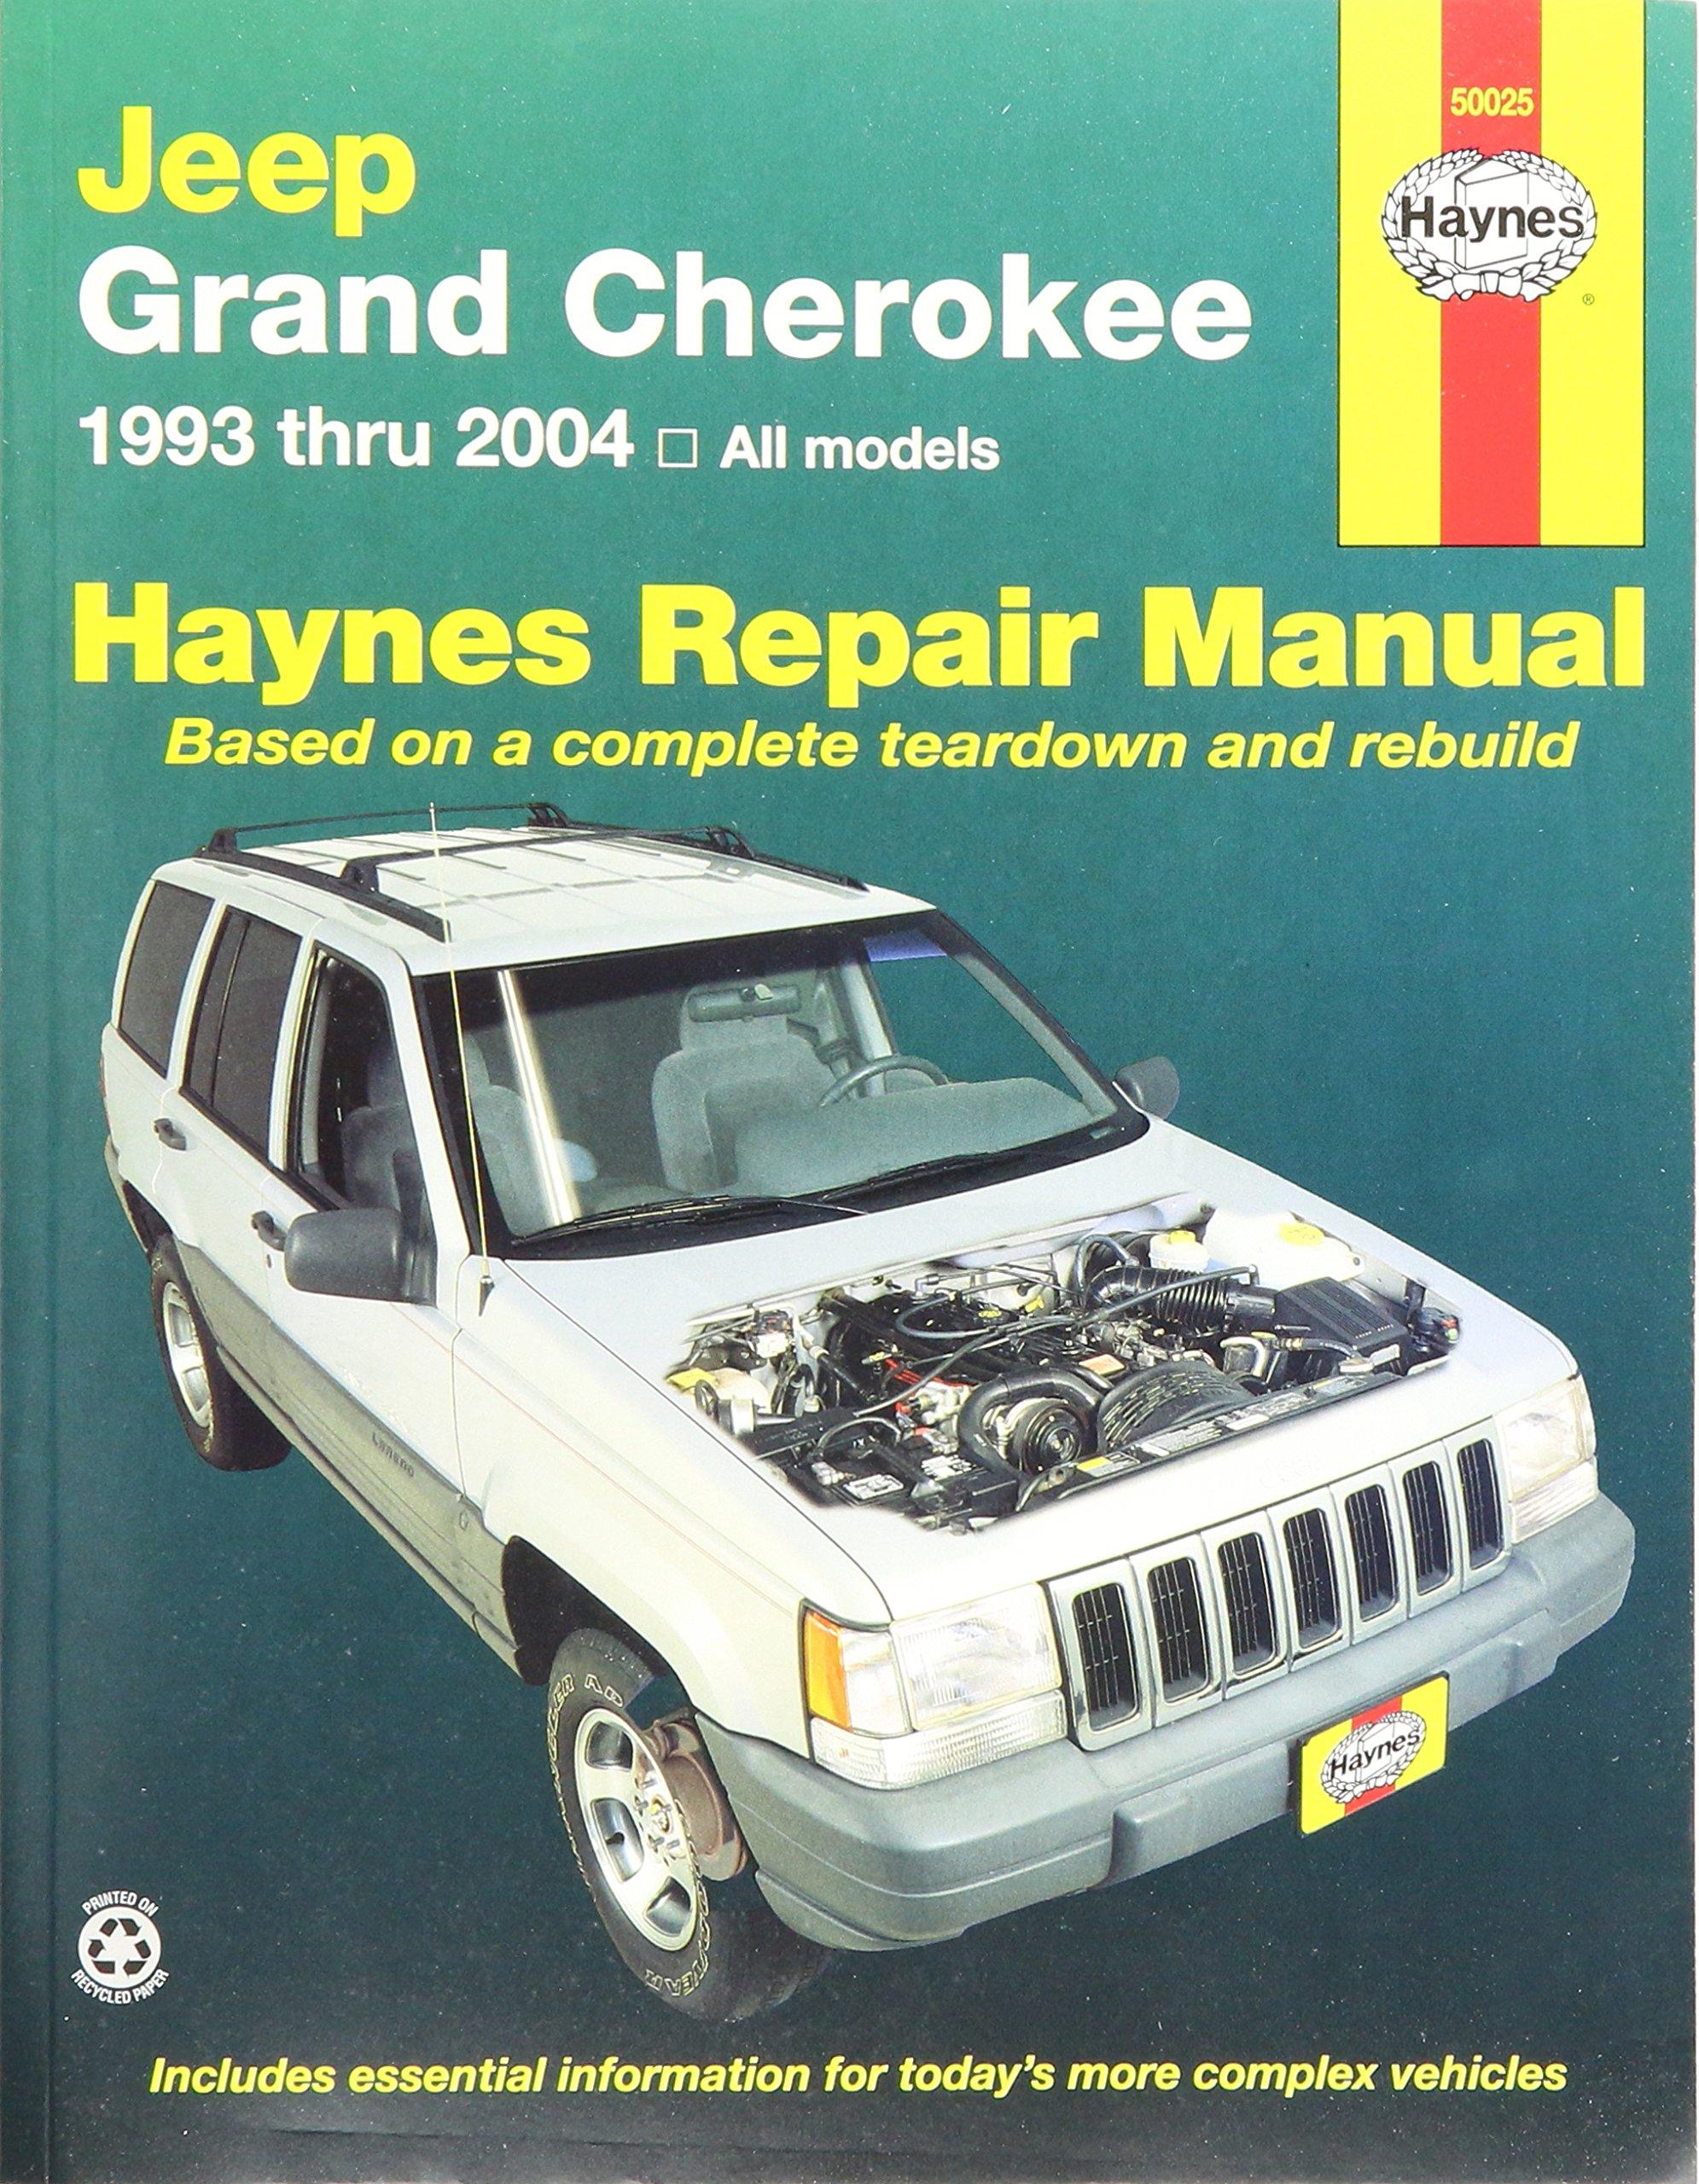 1998 yamaha c90 hp outboard service repair manual